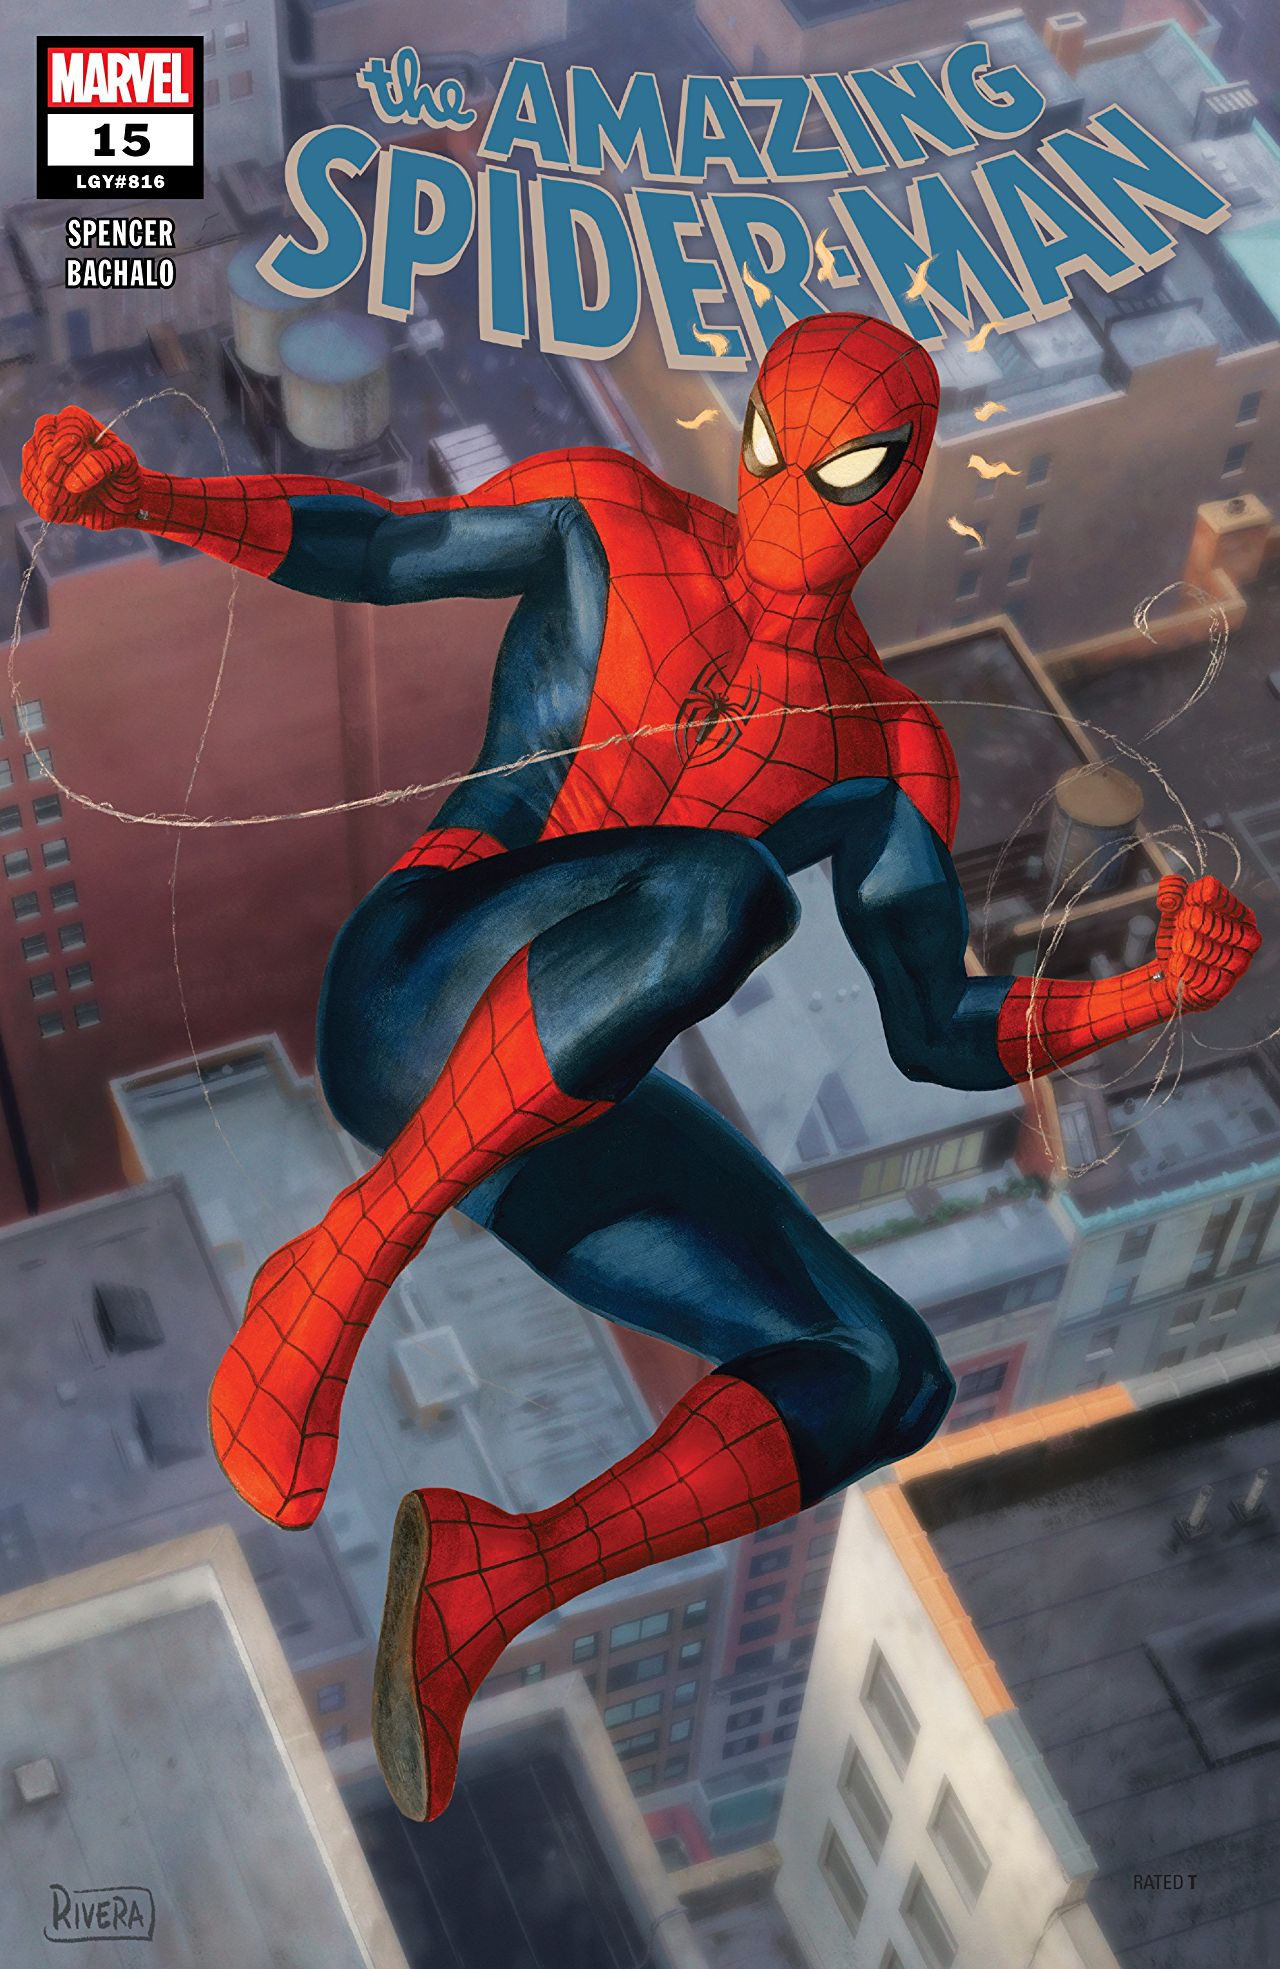 The Amazing Spider-Man 15